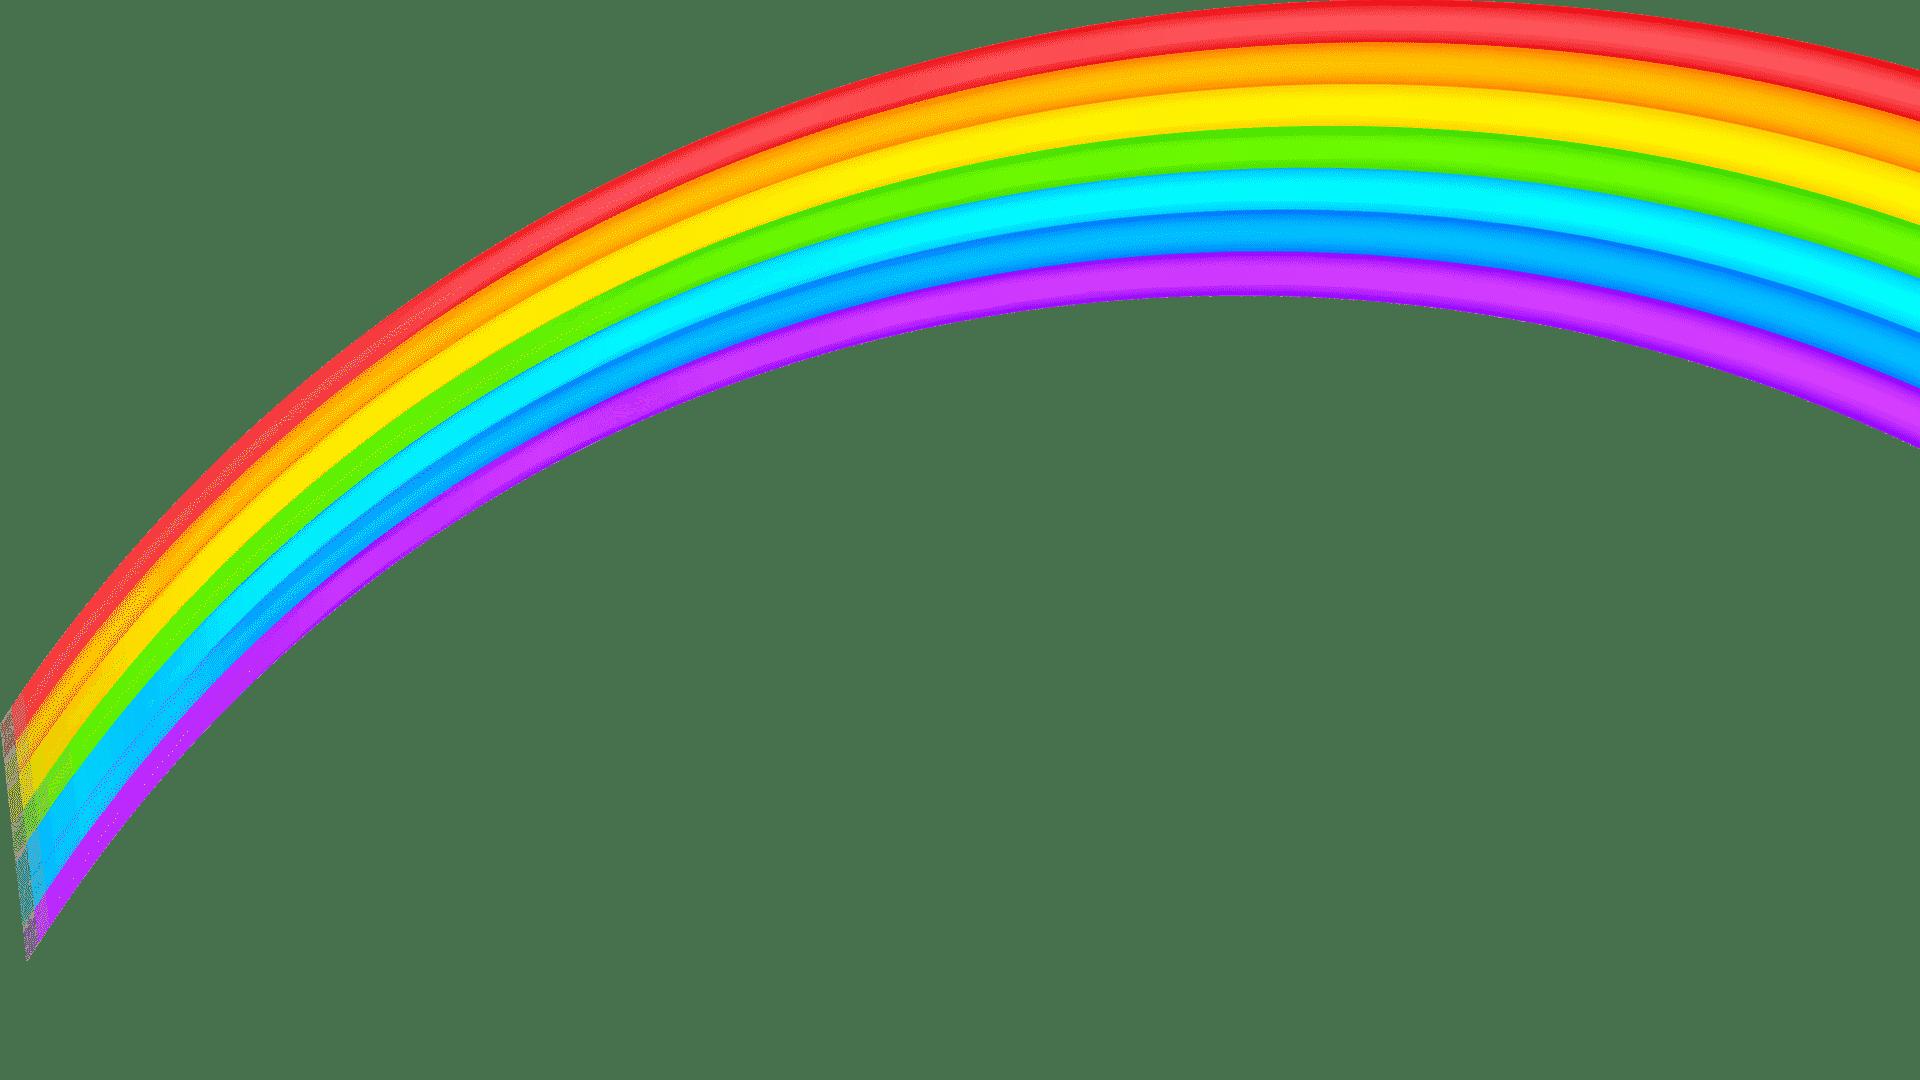 Stay Safe Rainbow